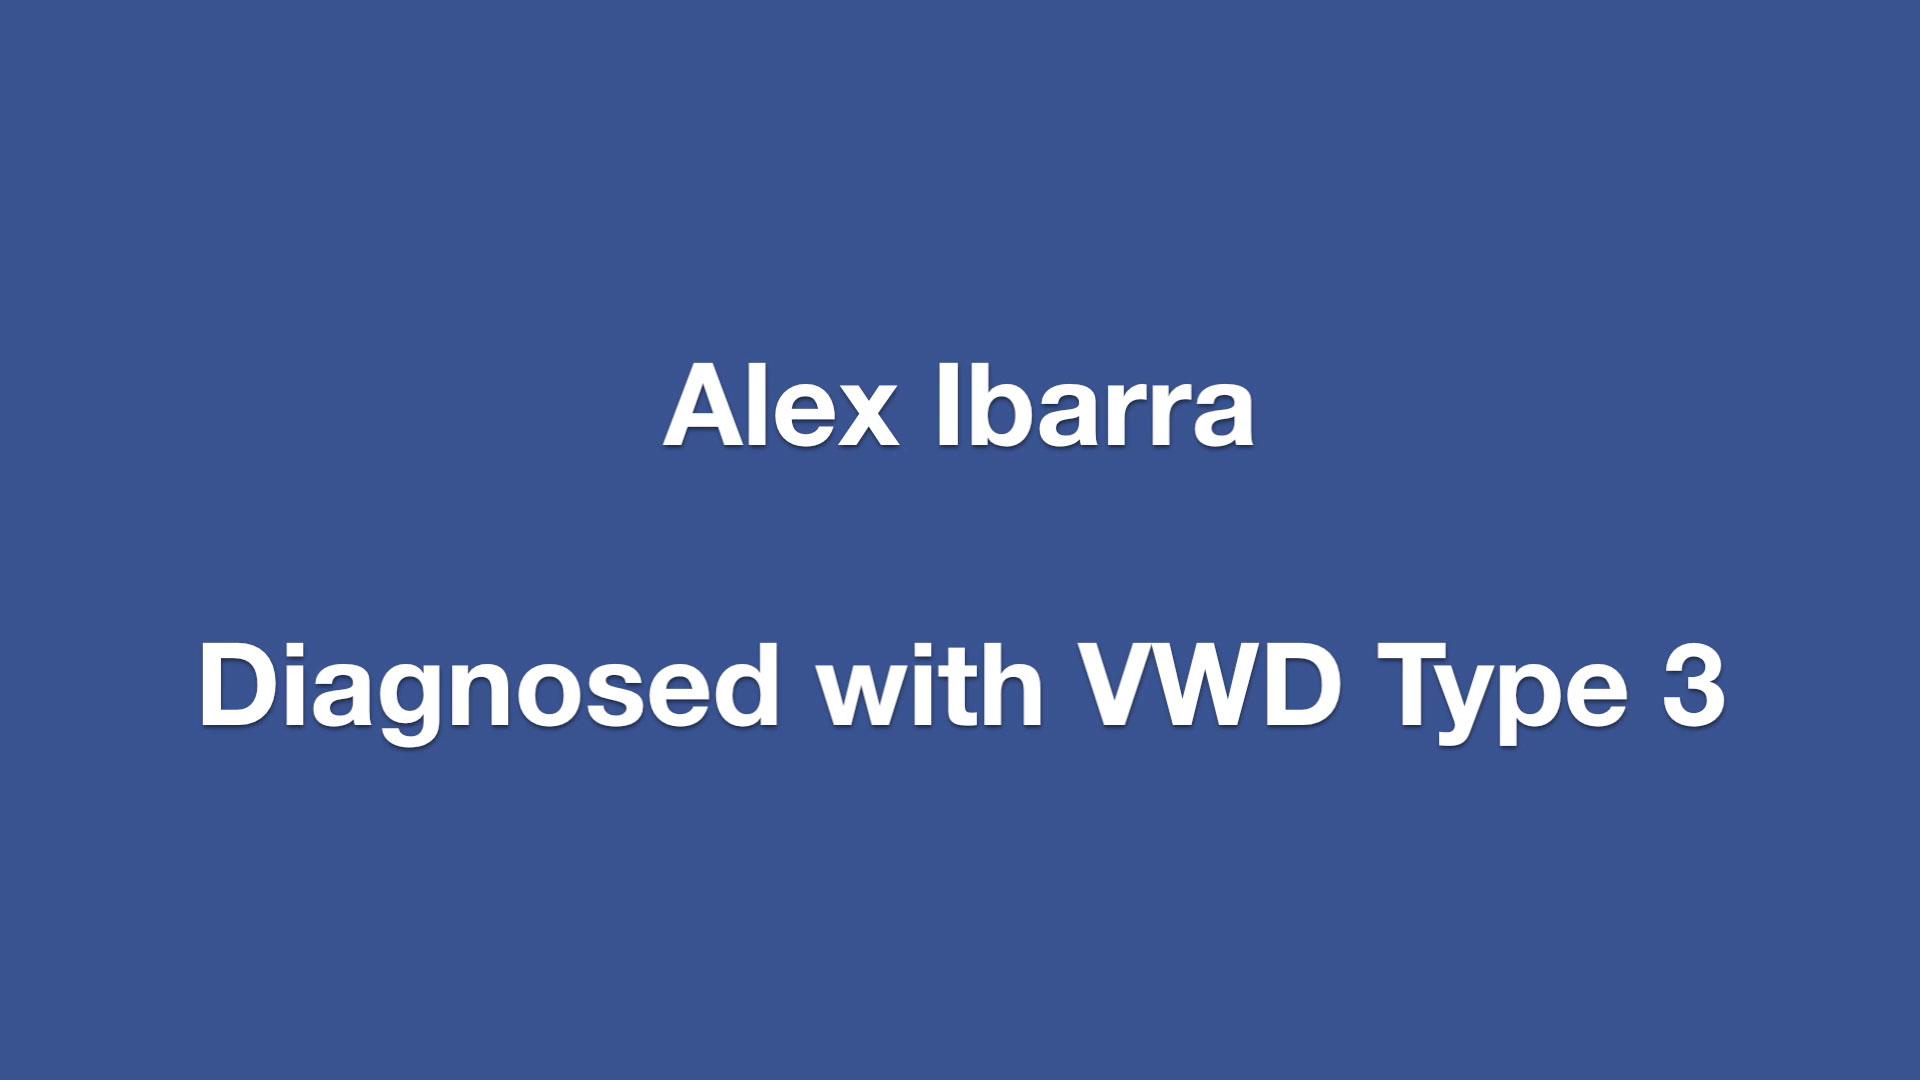 Alex Ibarra - Life with VWD